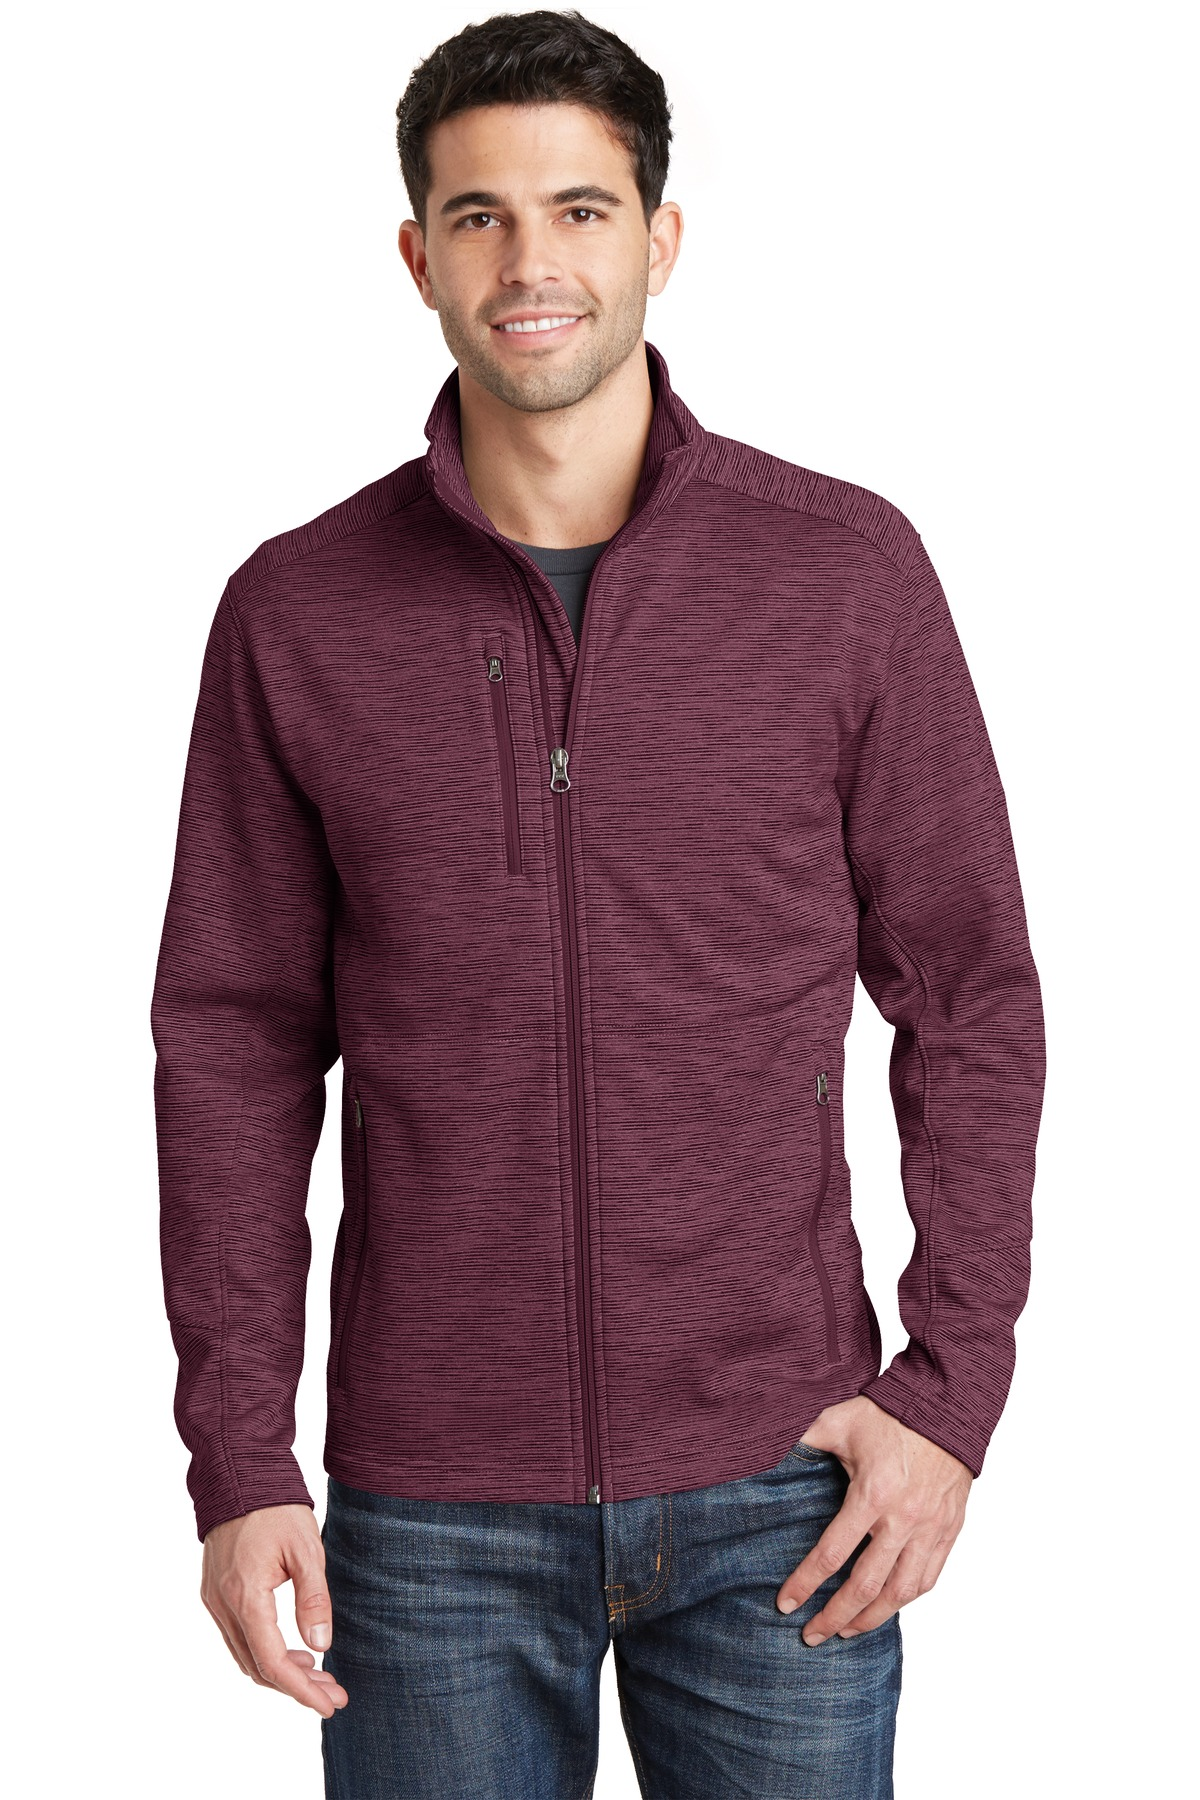 Port Authority  F231 - Digi Stripe Fleece Jacket